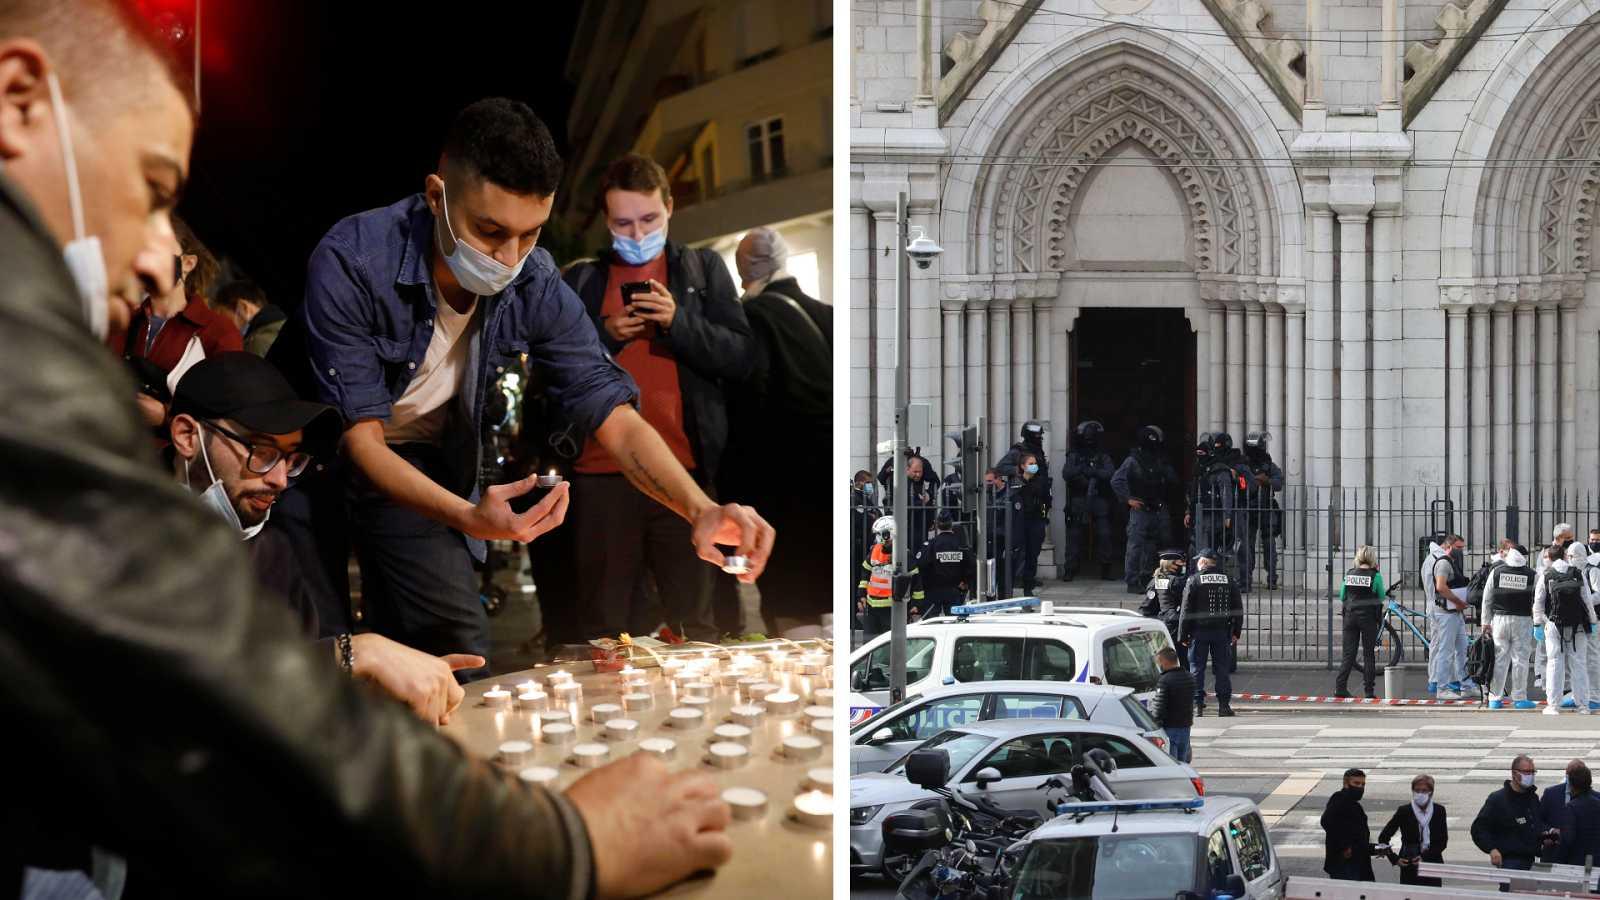 Cinco continentes - Francia: atentado yihadista en Niza - Escuchar ahora